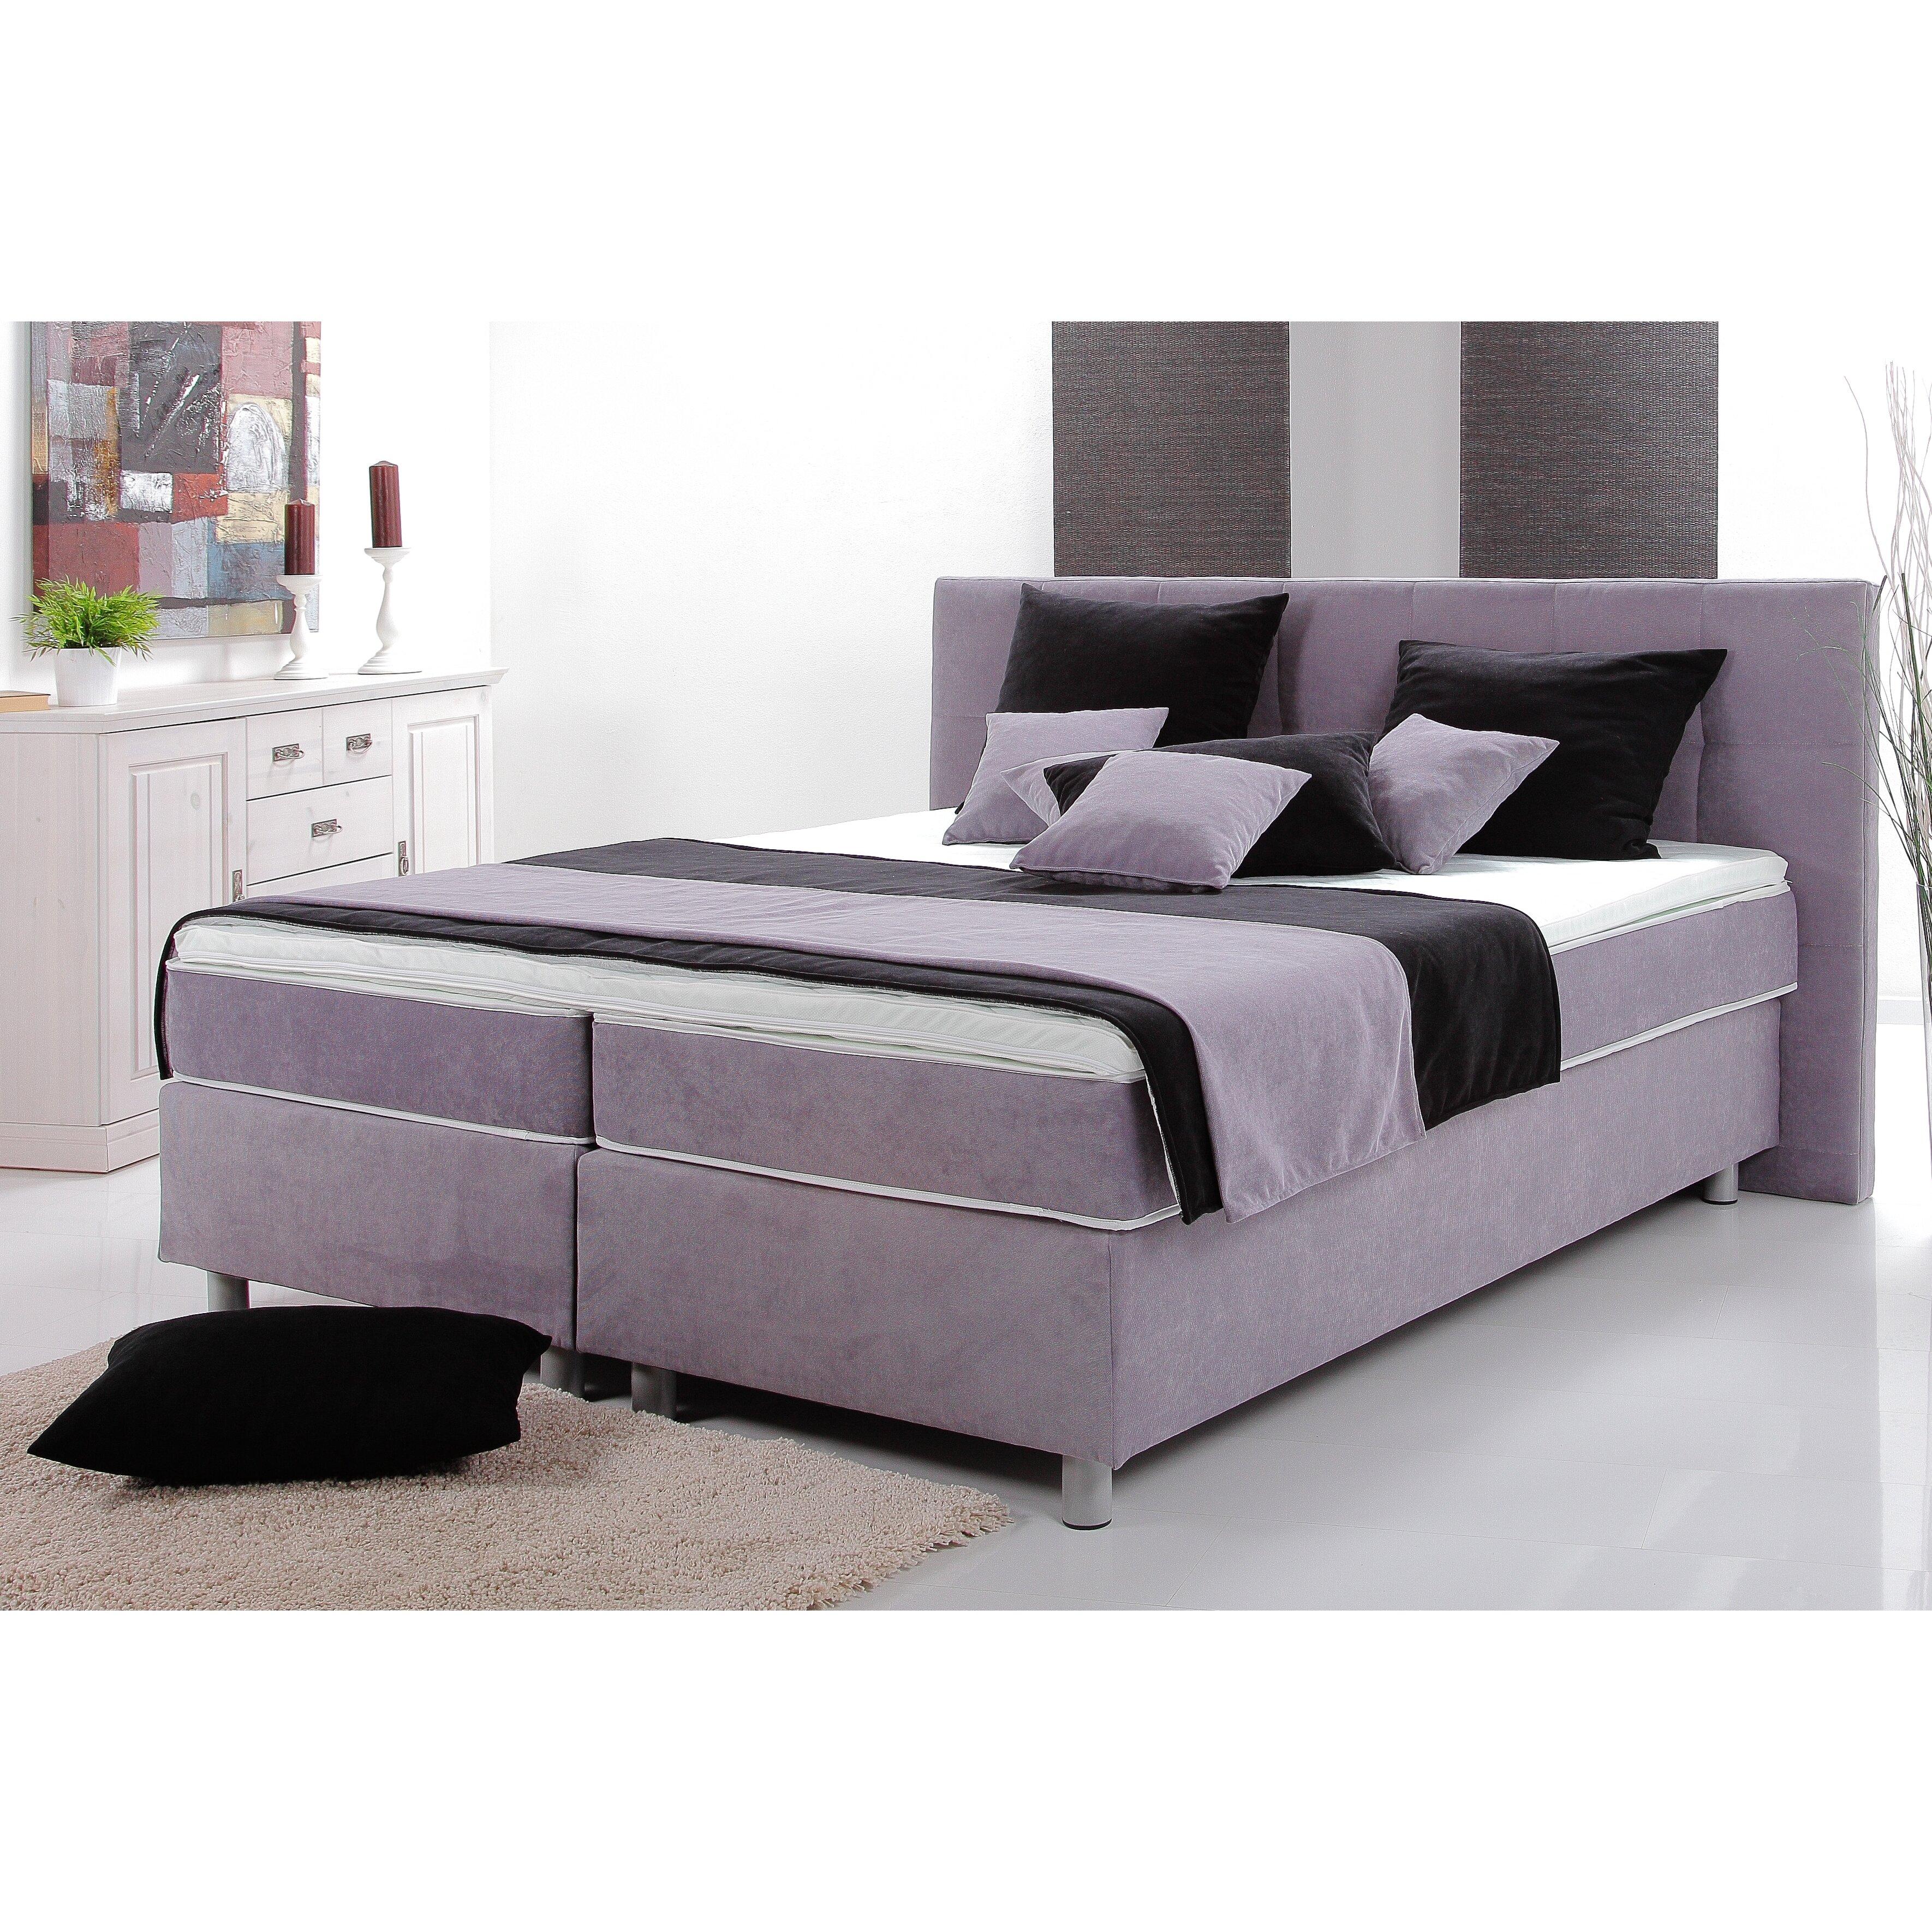 breckle boxspringbett miami mit topper bewertungen. Black Bedroom Furniture Sets. Home Design Ideas